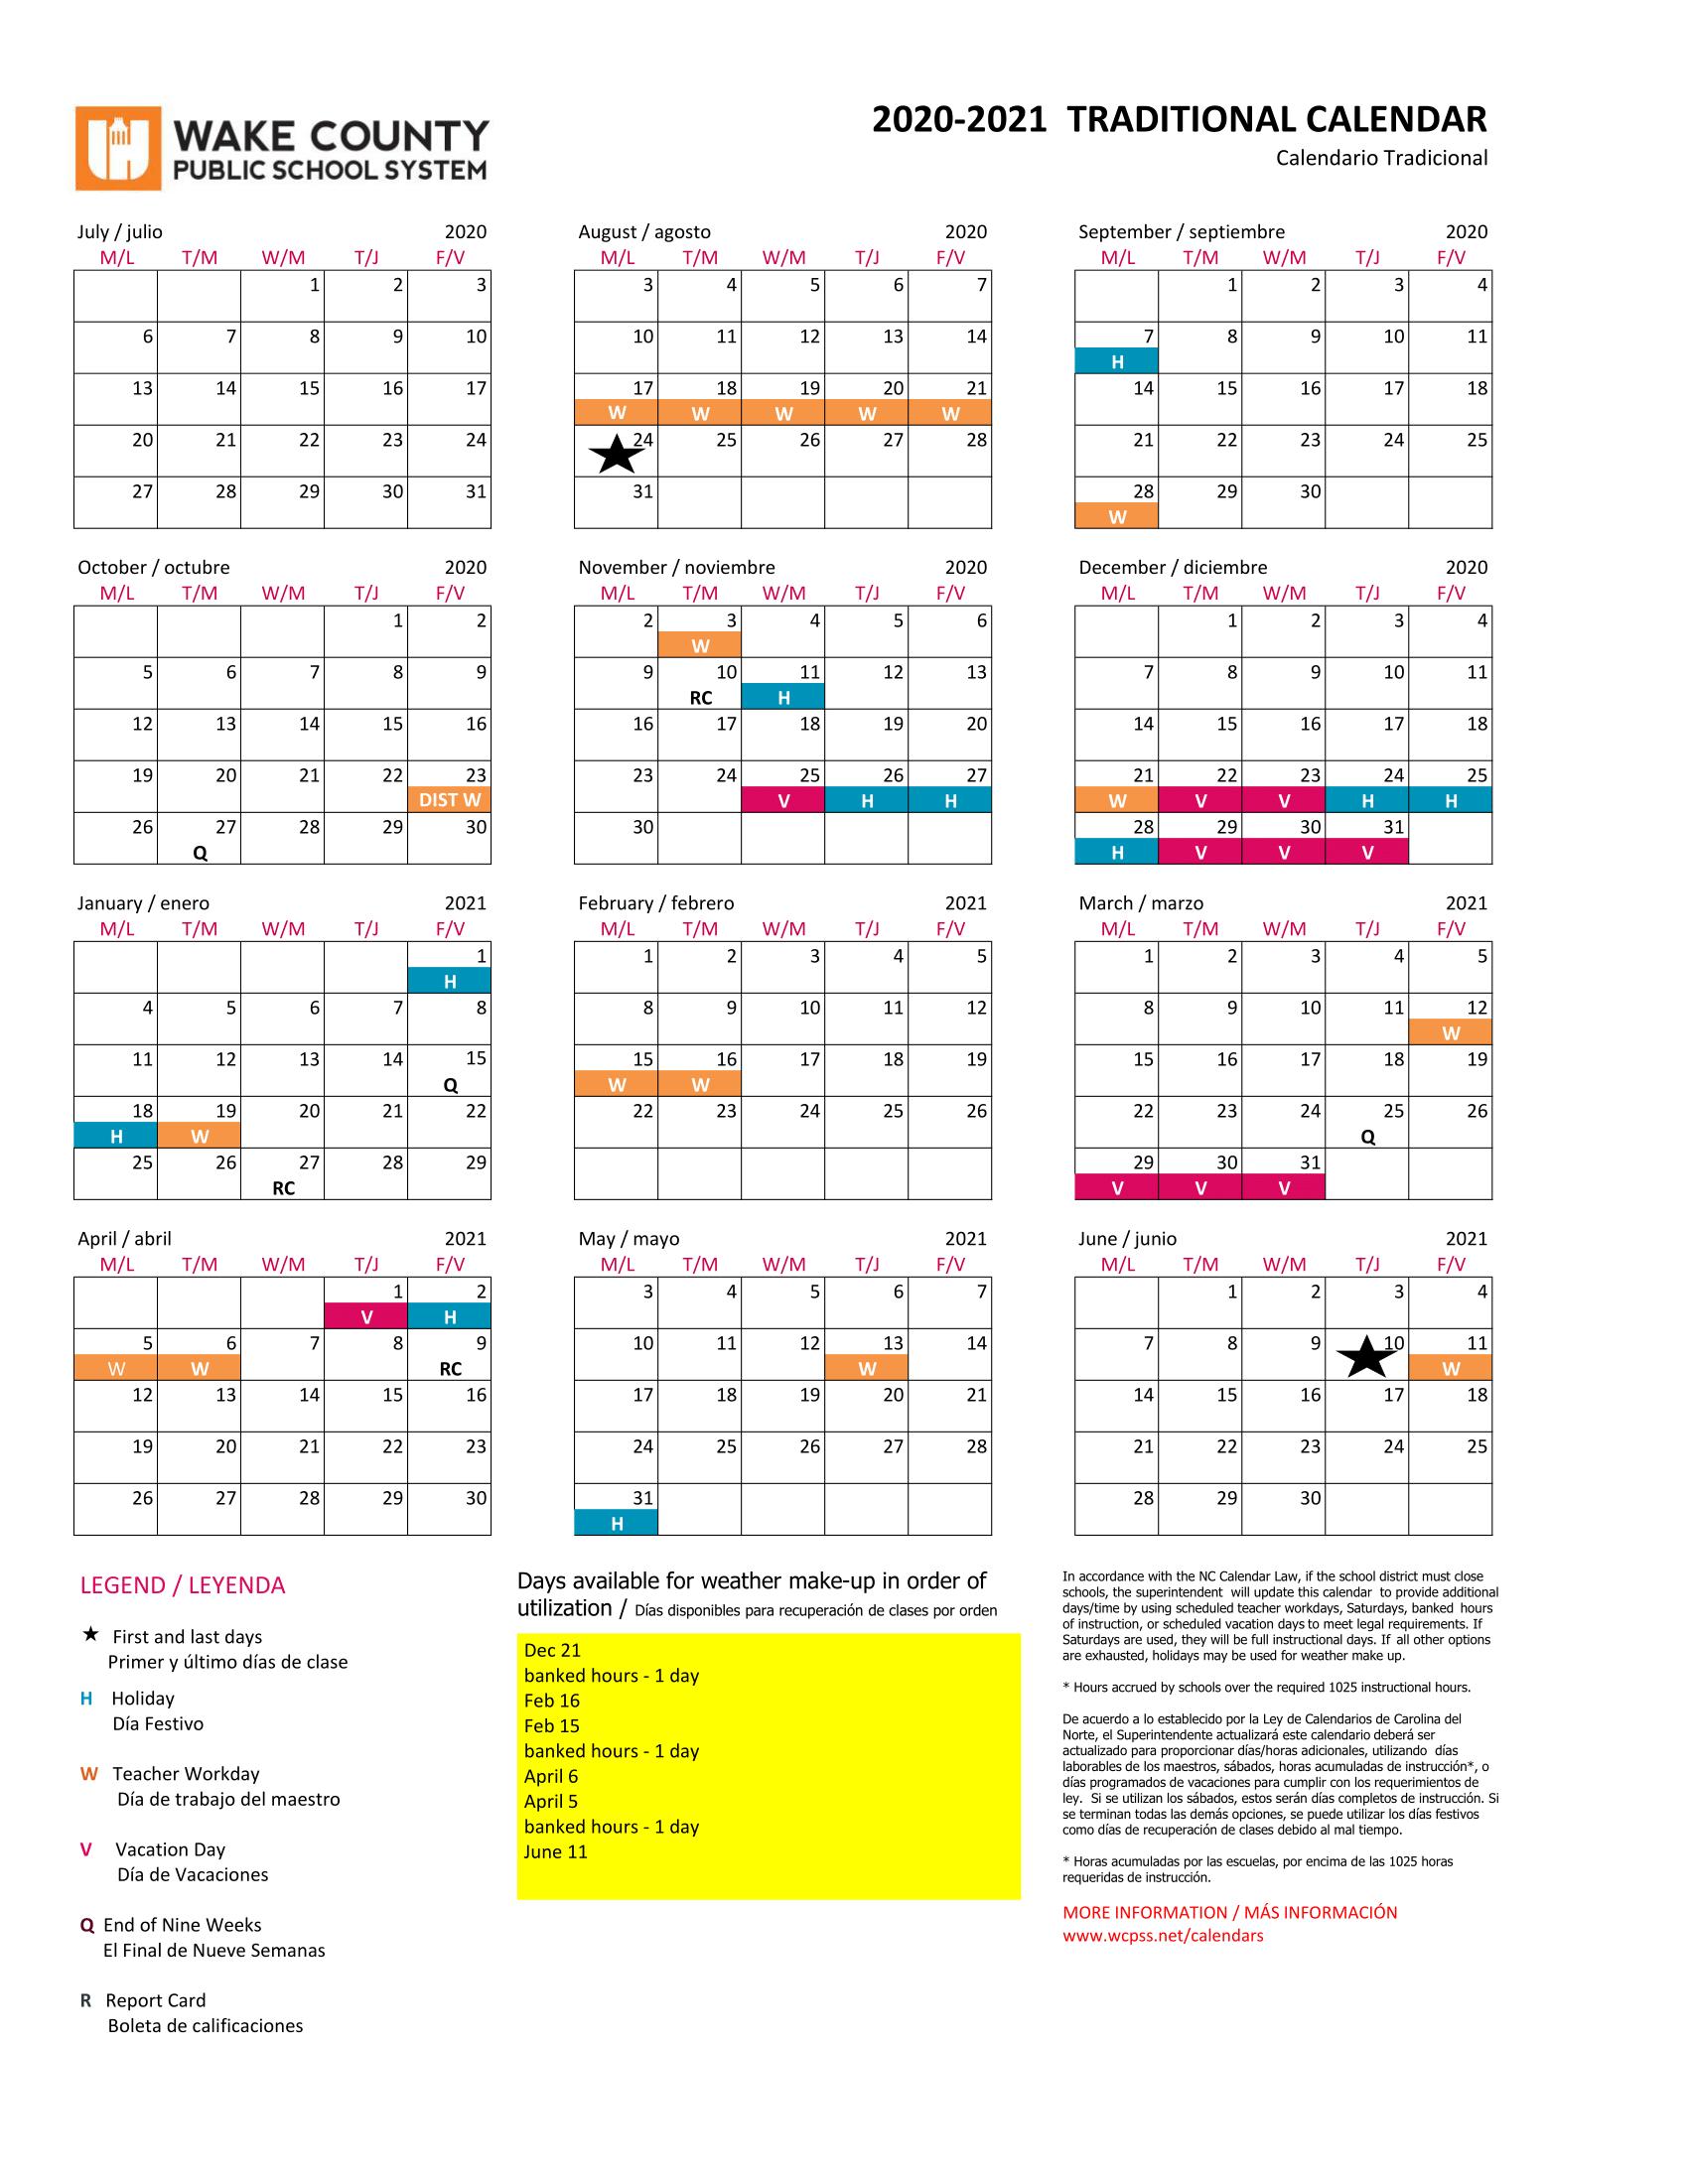 Wake County Public Schools Christmas Break 2020 2020 Wake County Public School Calendar [PDF] | County School Calendar